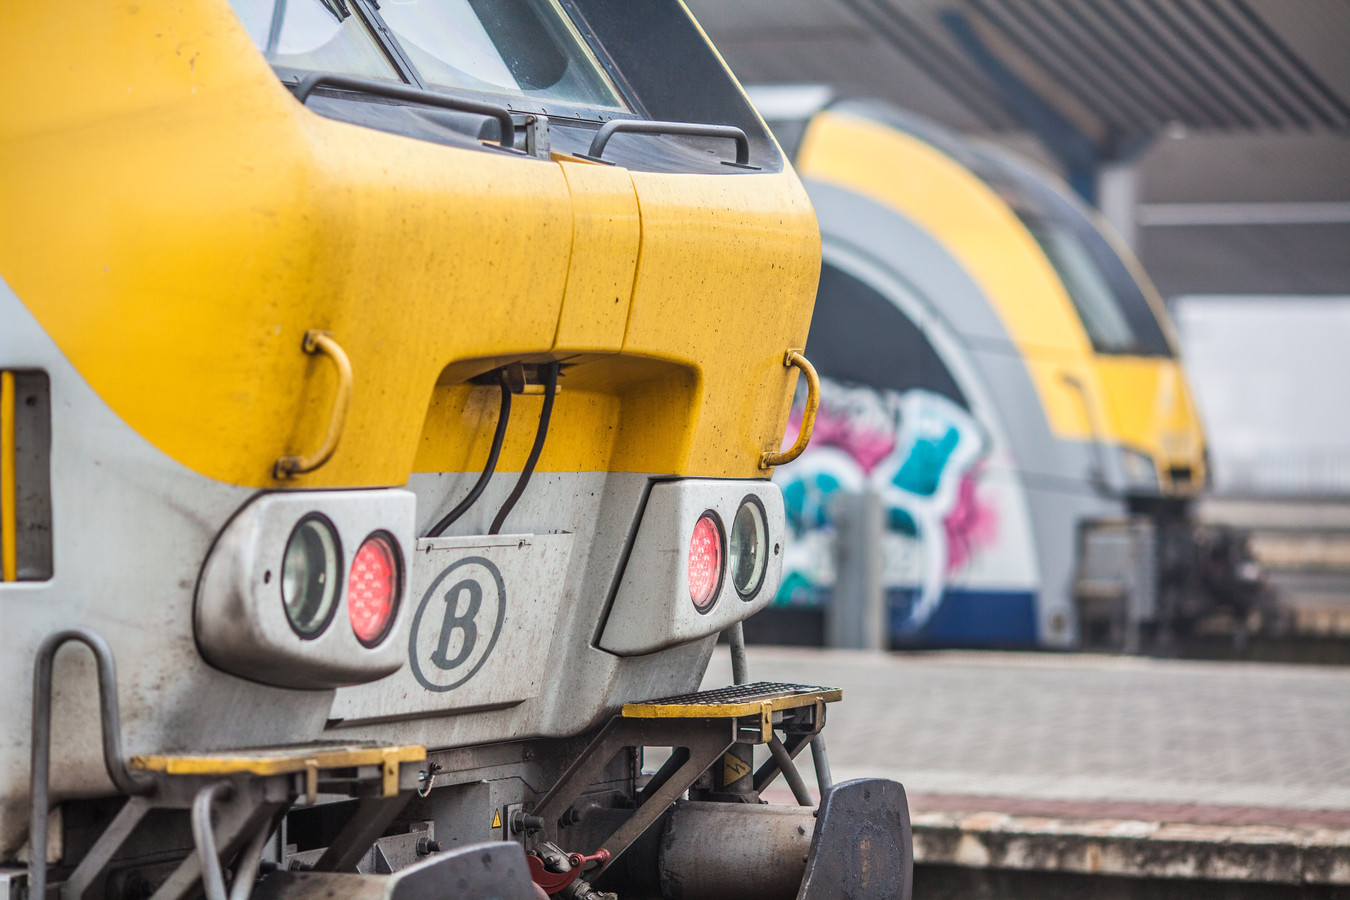 Train SNCB en gare de Charleroi-Sud